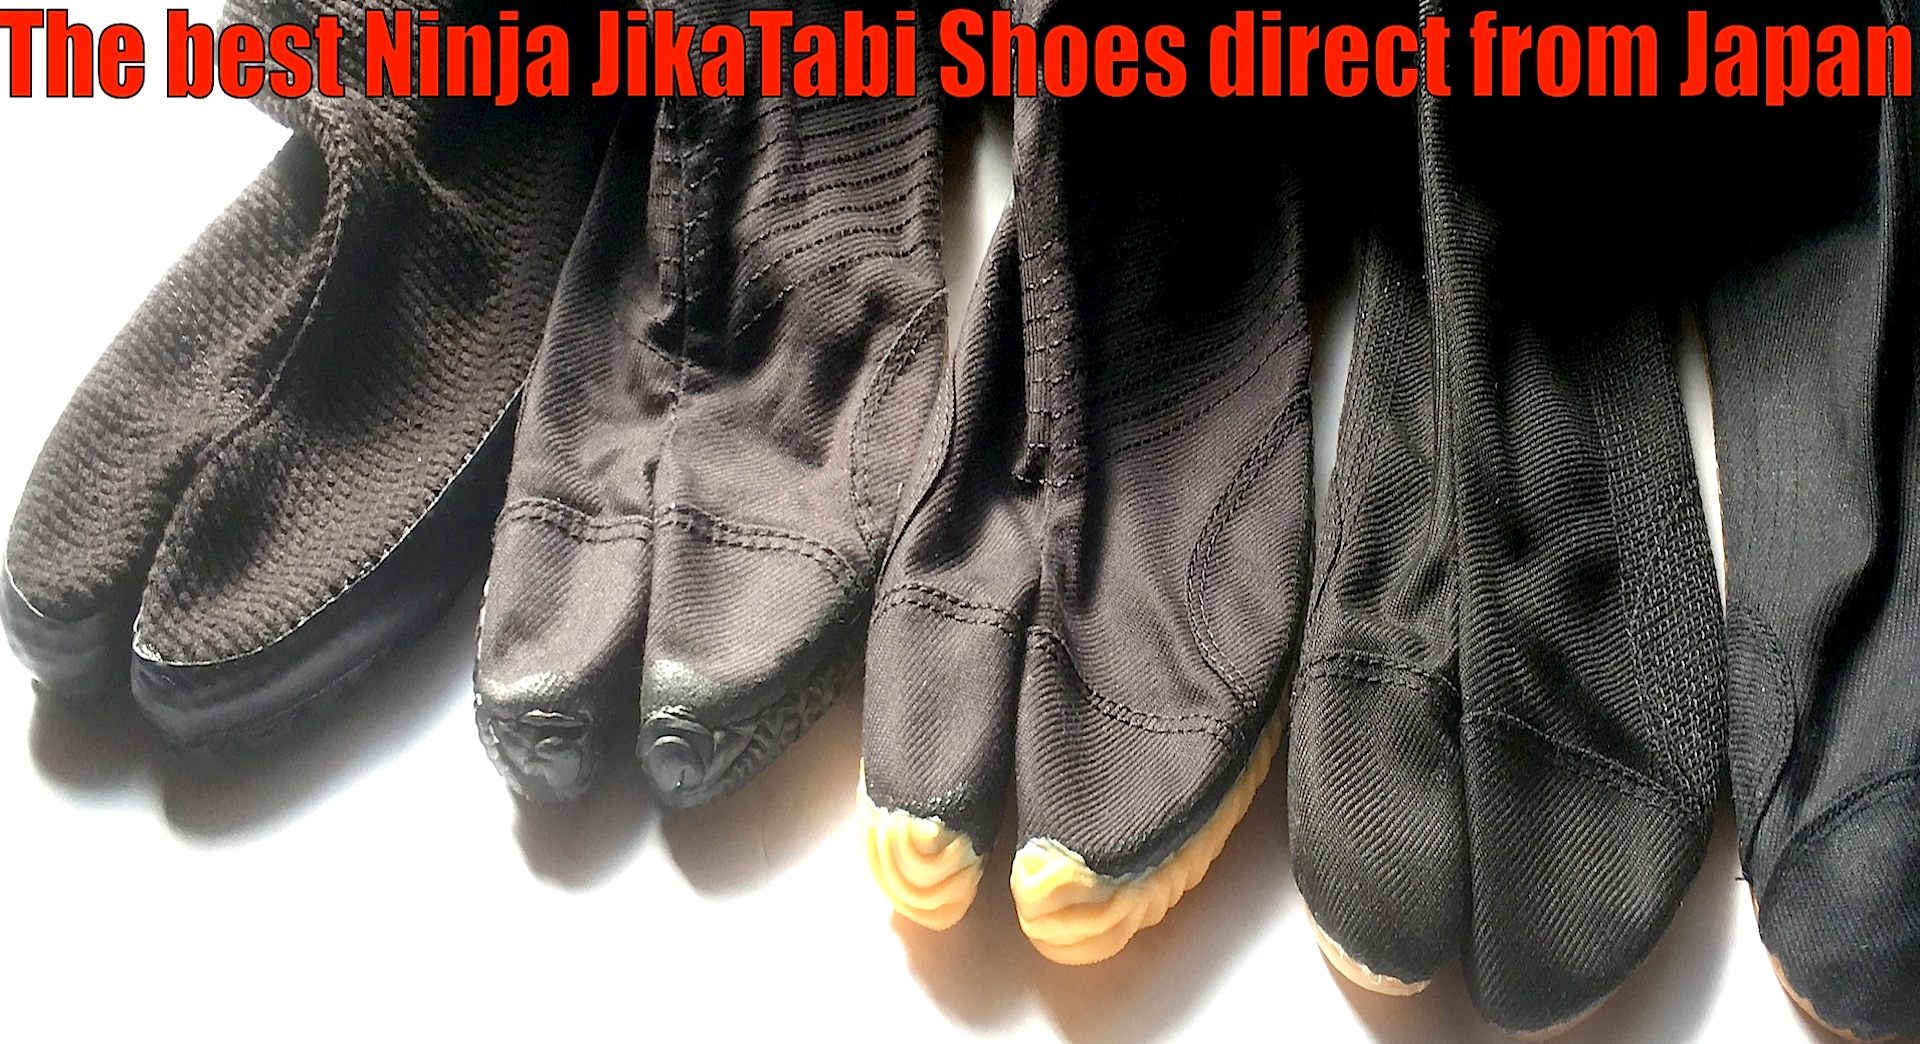 Le plus grand choix de Jikatabi (Chaussure Ninja) pour le Ninjutsu !